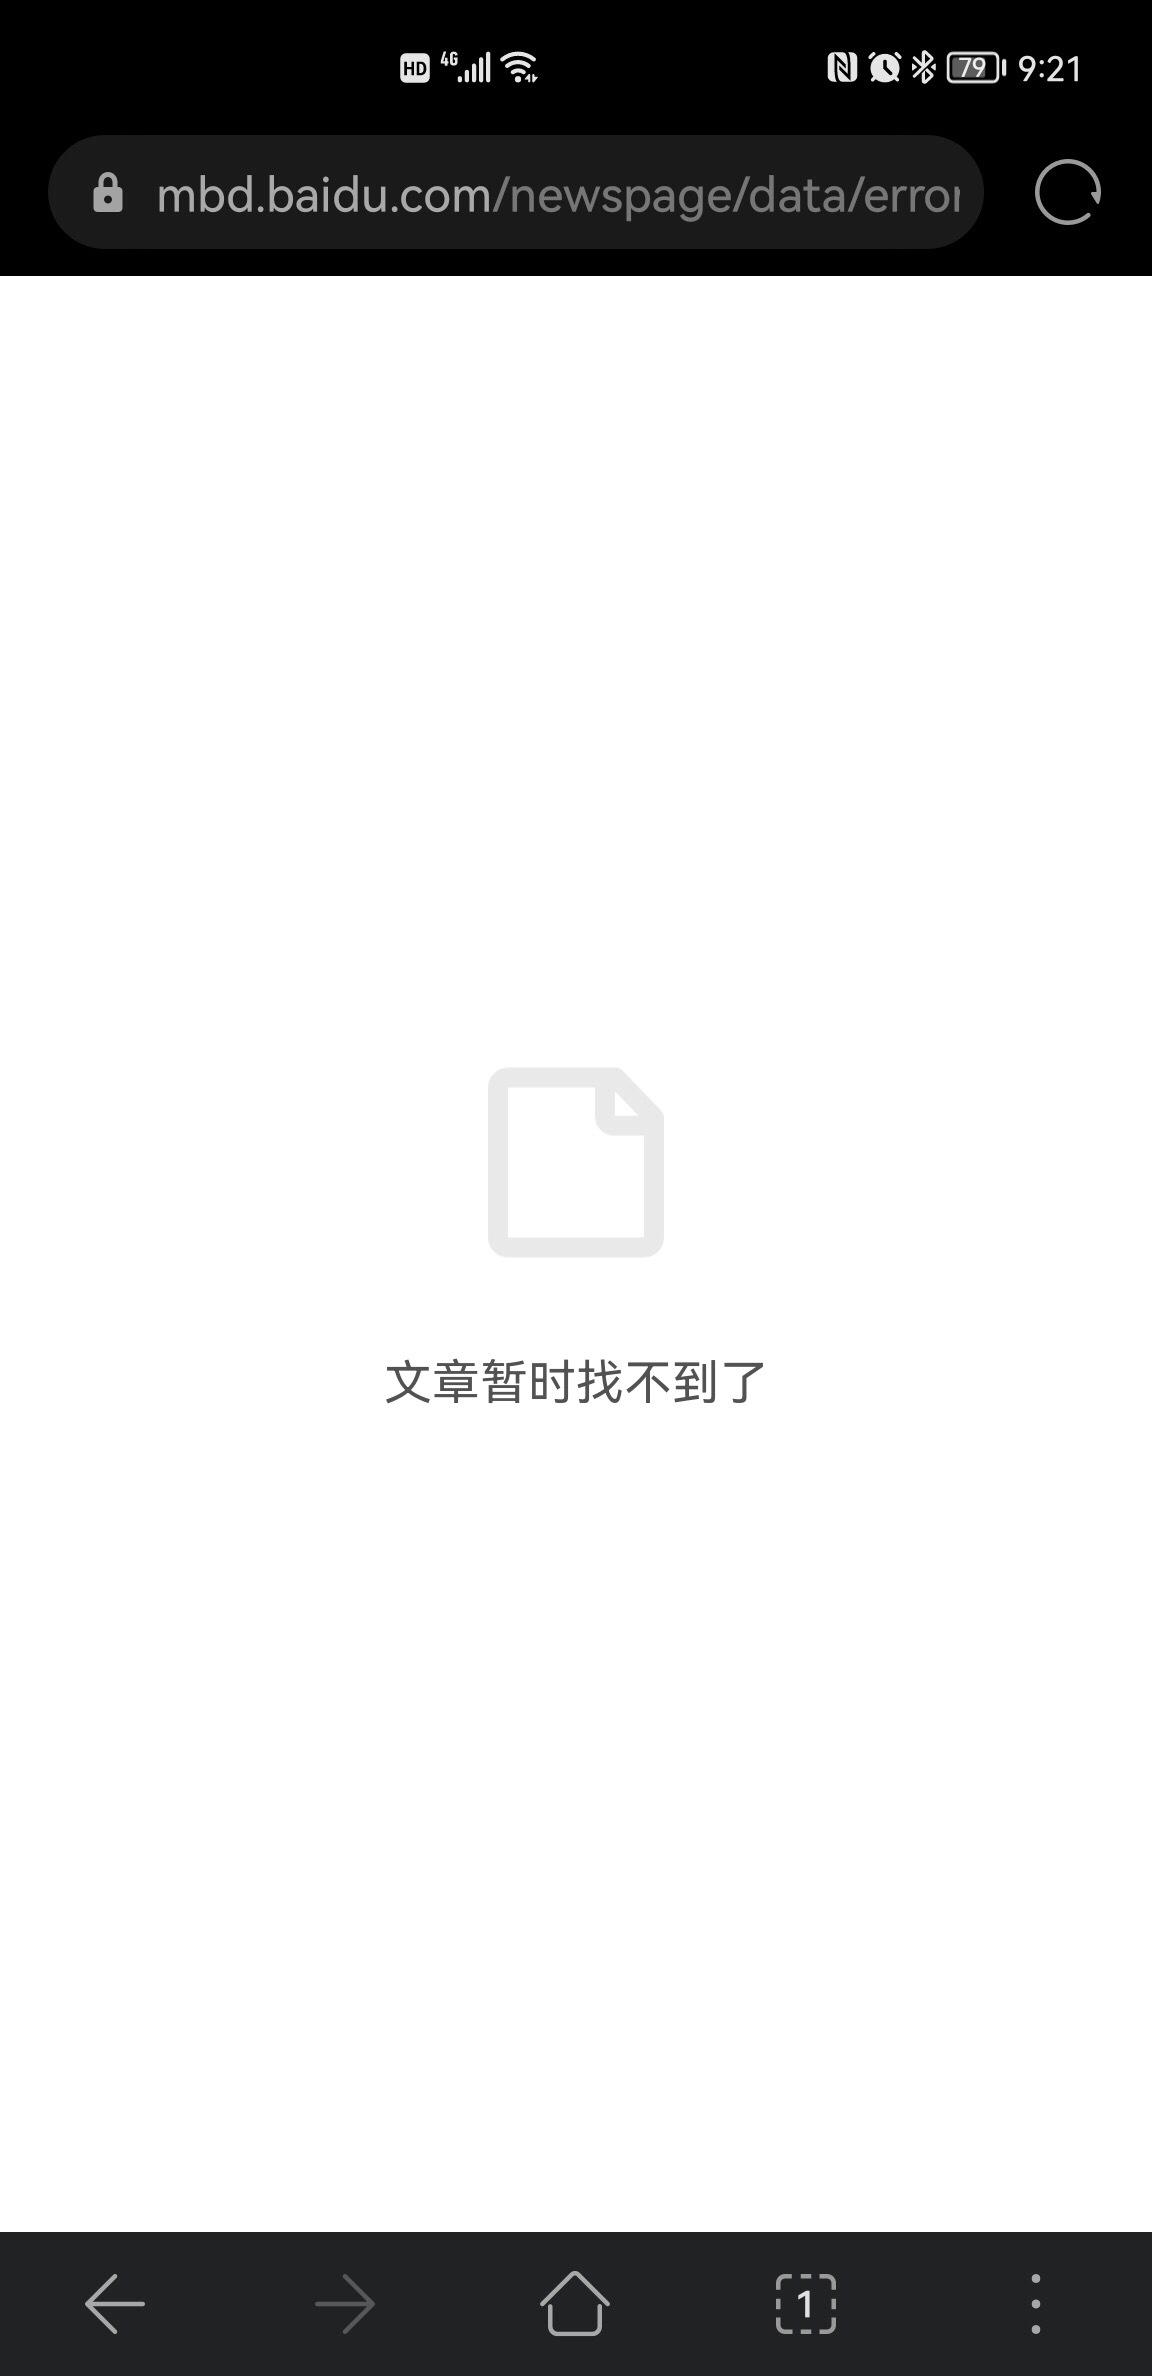 https://na.cx/i/2qGK0xN.jpg